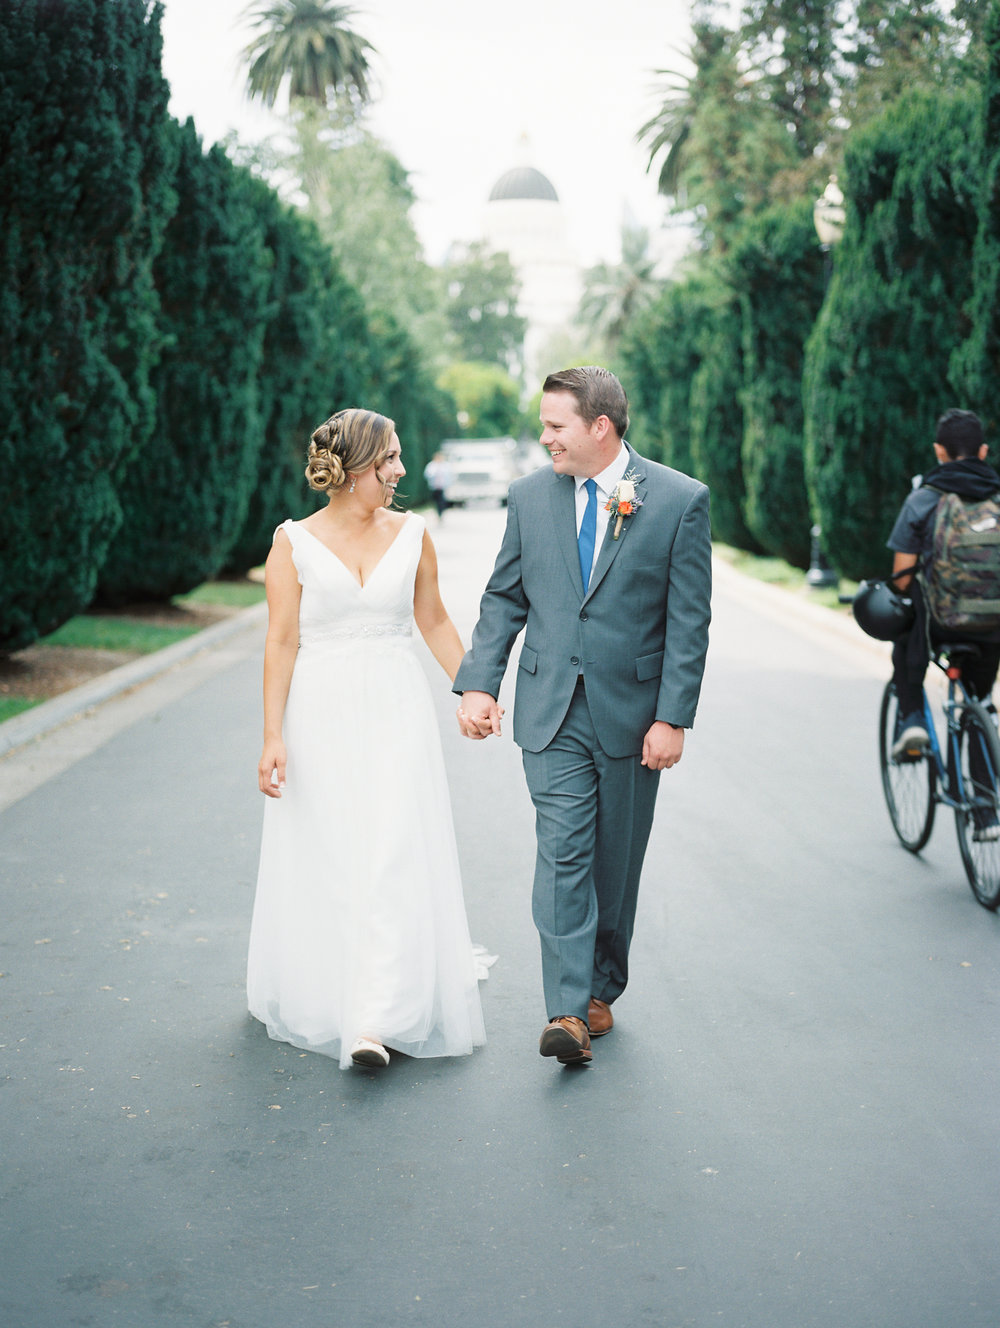 city-hall-wedding-filmscans-11.jpg